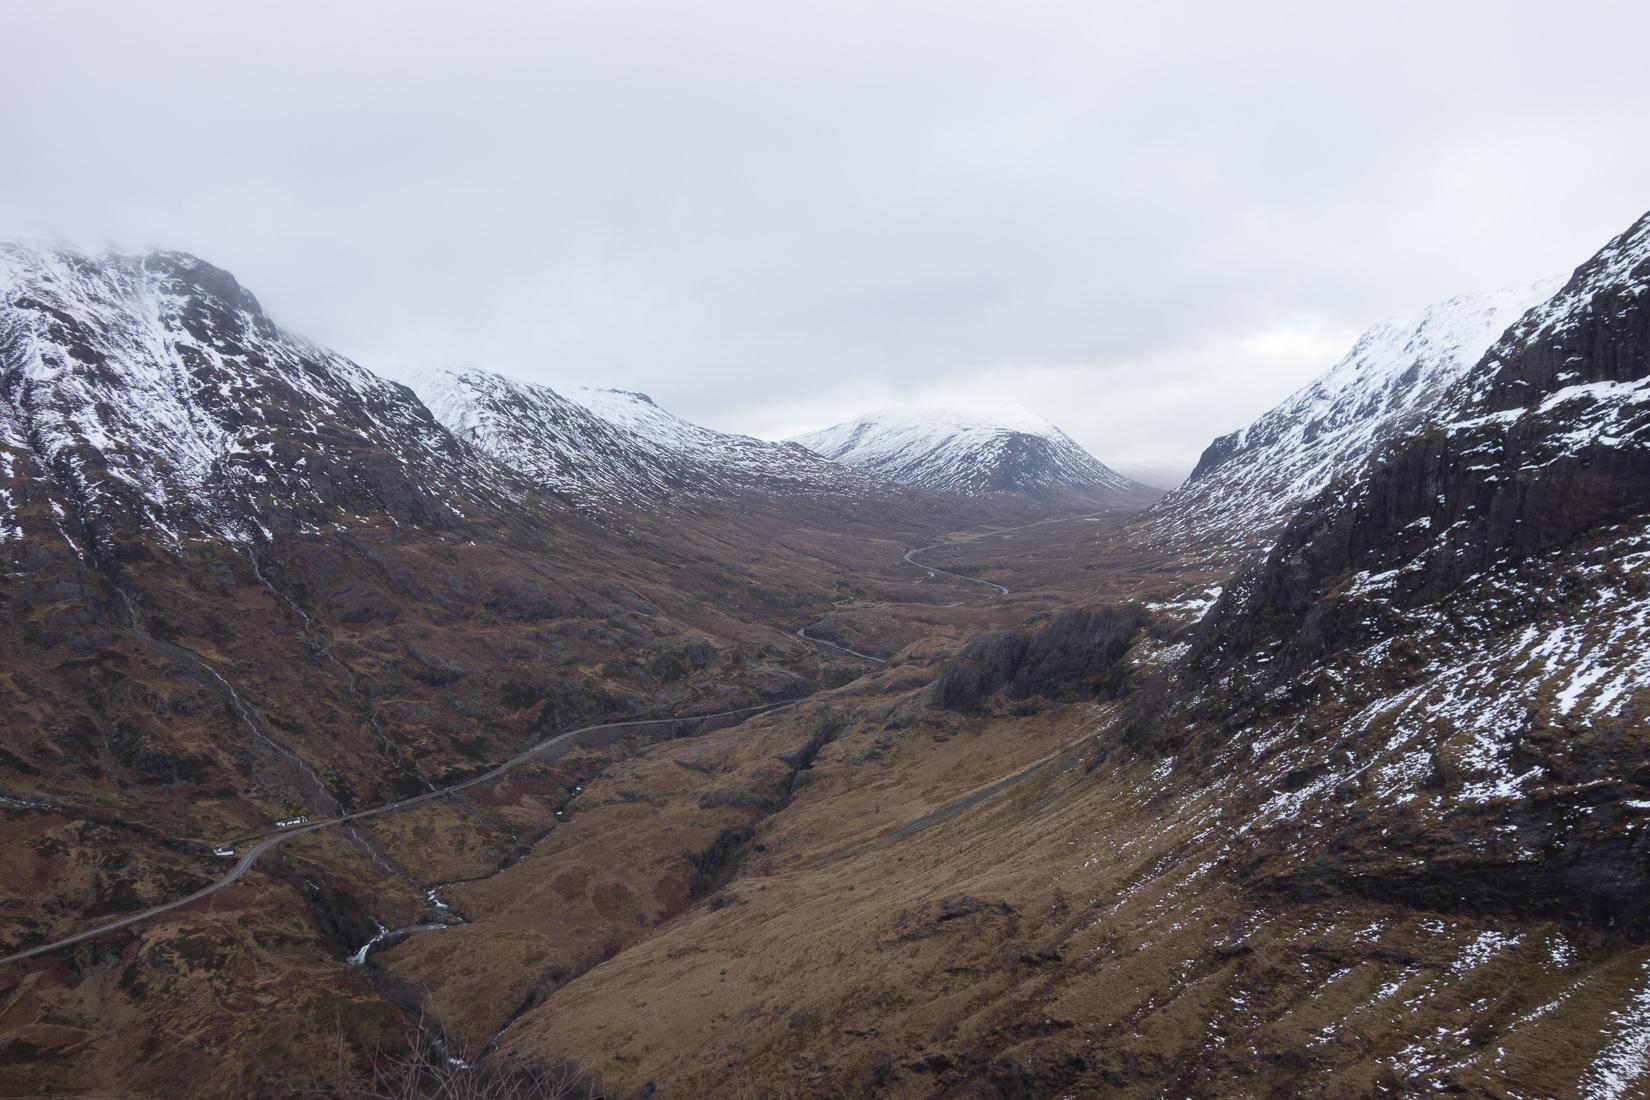 Great view of Glencoe